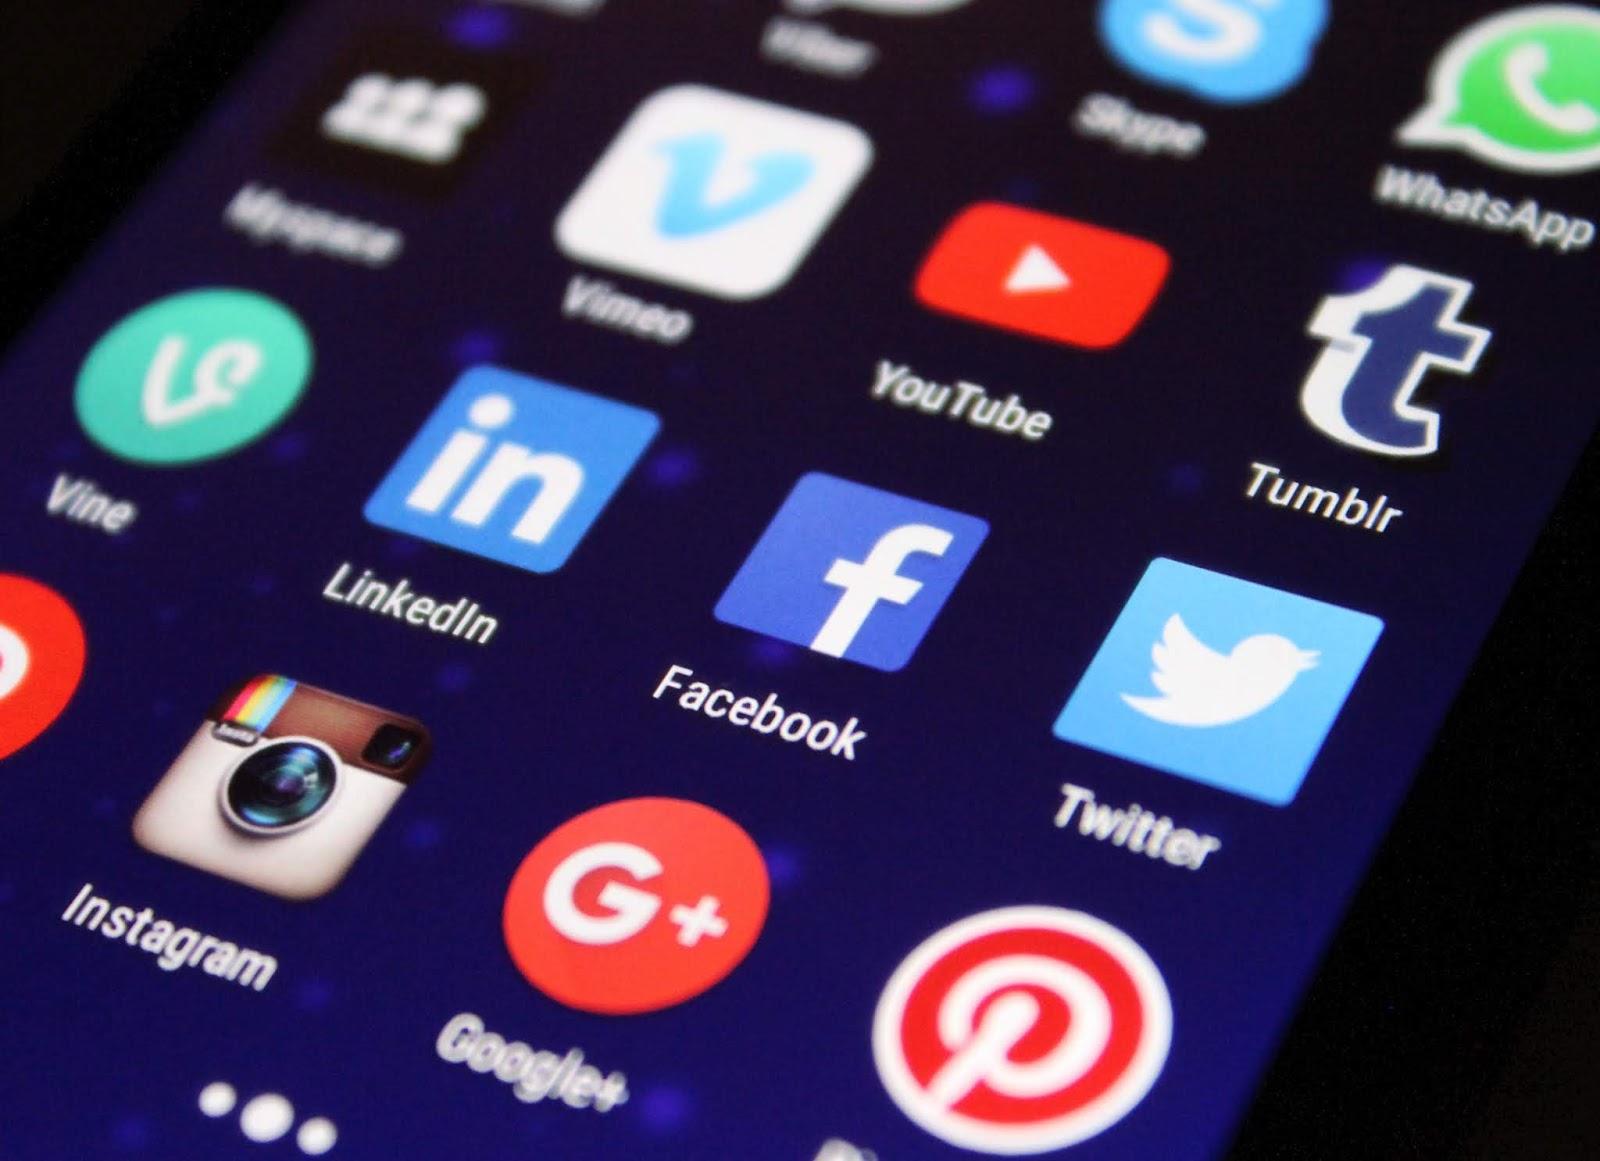 Auto-share post on Social Media